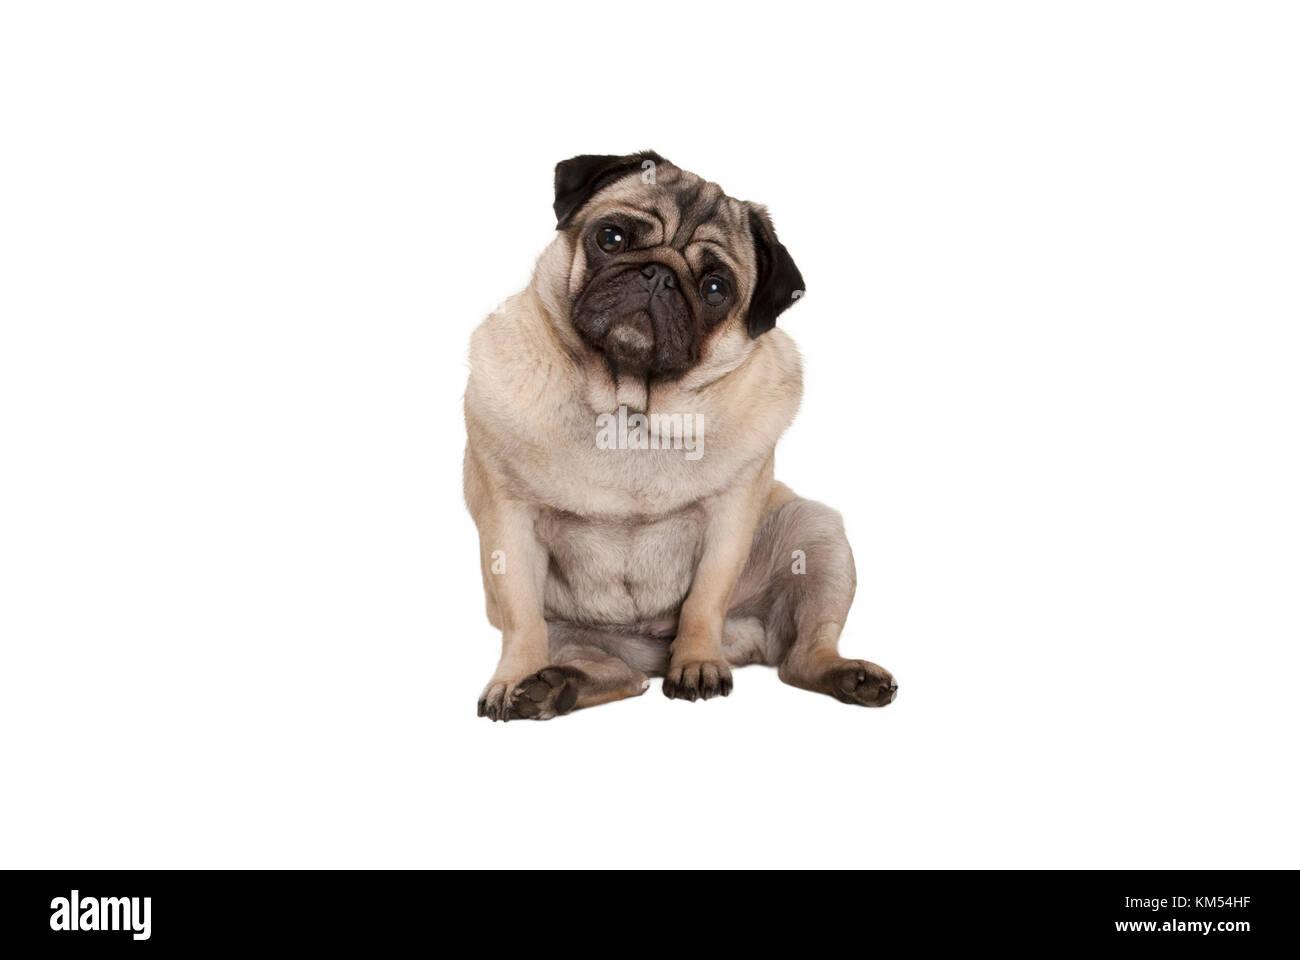 Lindo perrito pug inteligente con cheecky cara, sentarse, aislado sobre fondo blanco. Imagen De Stock